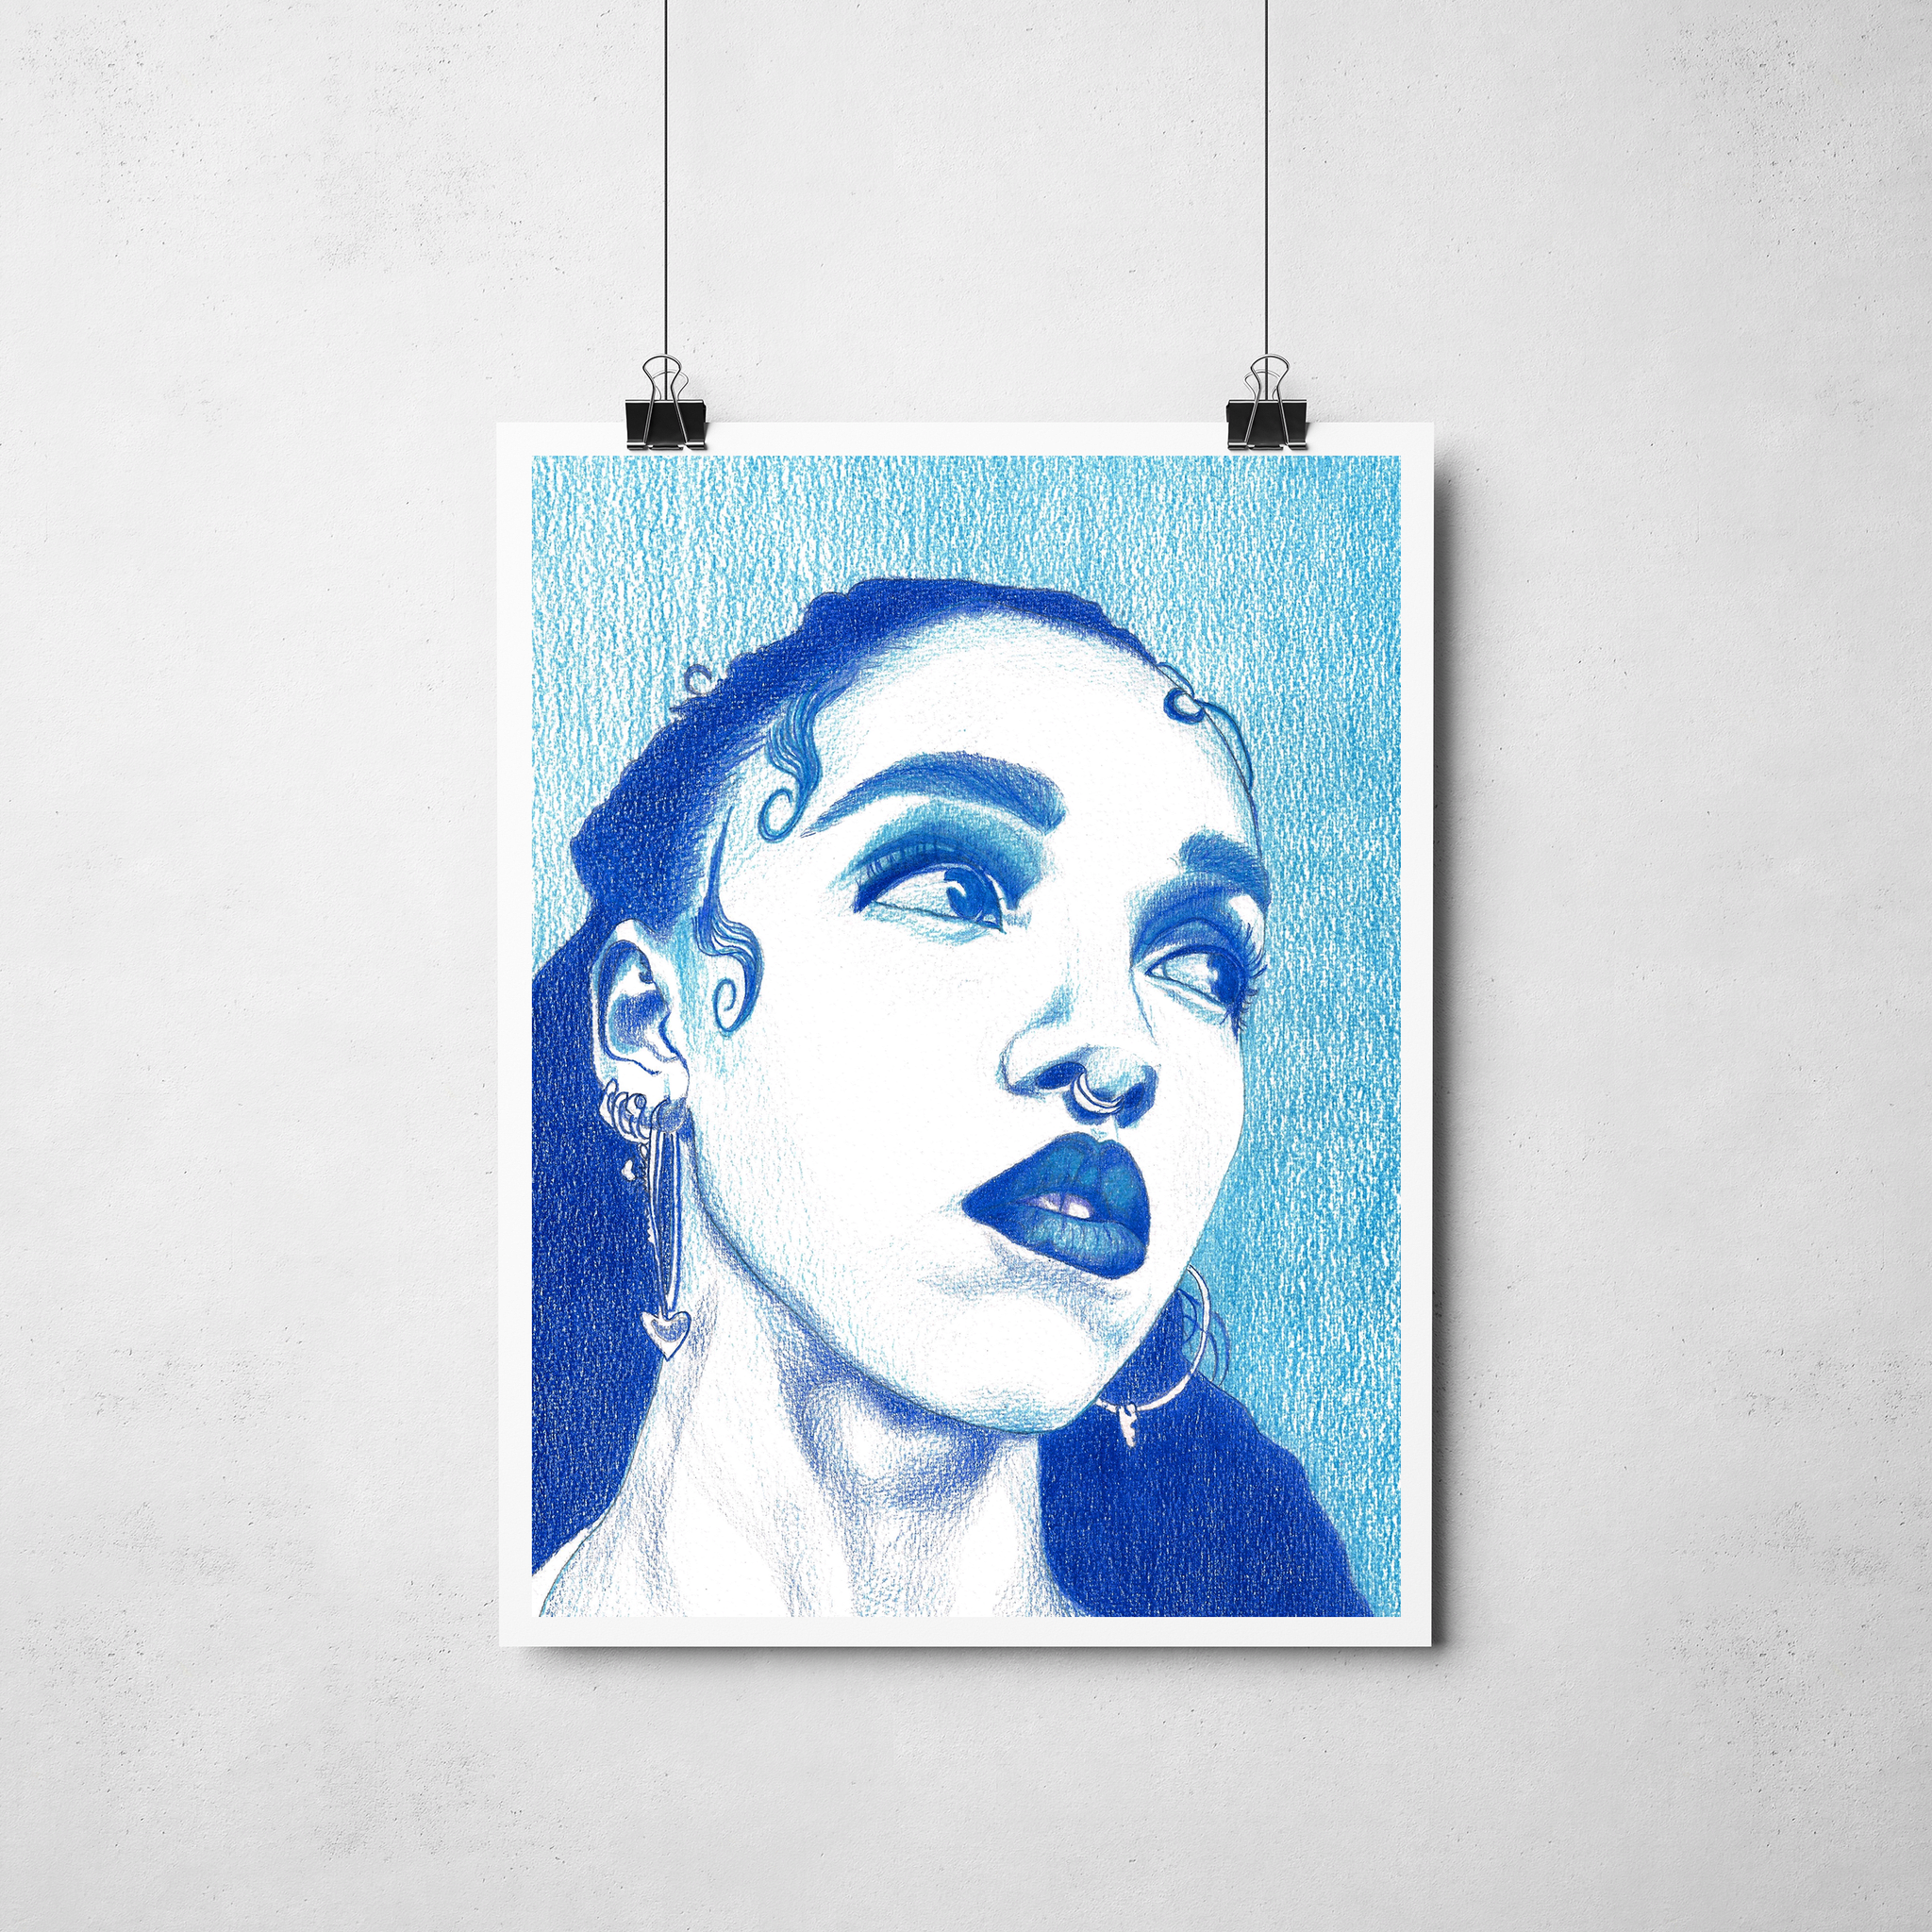 Lámina Ilustracion  FKA Twigs (azul) -  Roció Mera